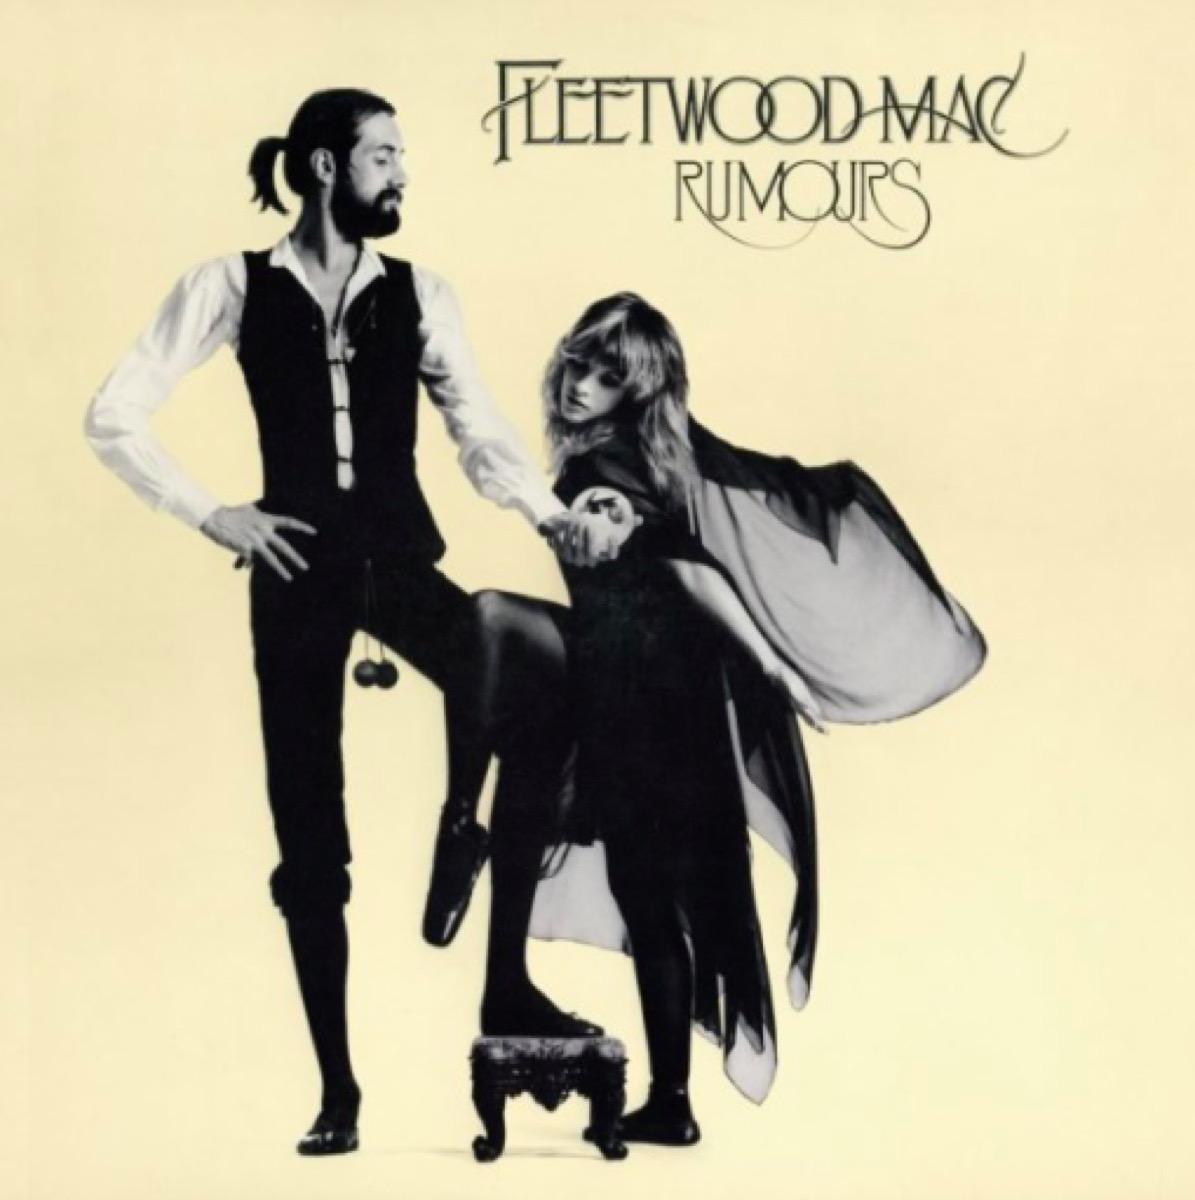 Rumours Fleetwood Mac album